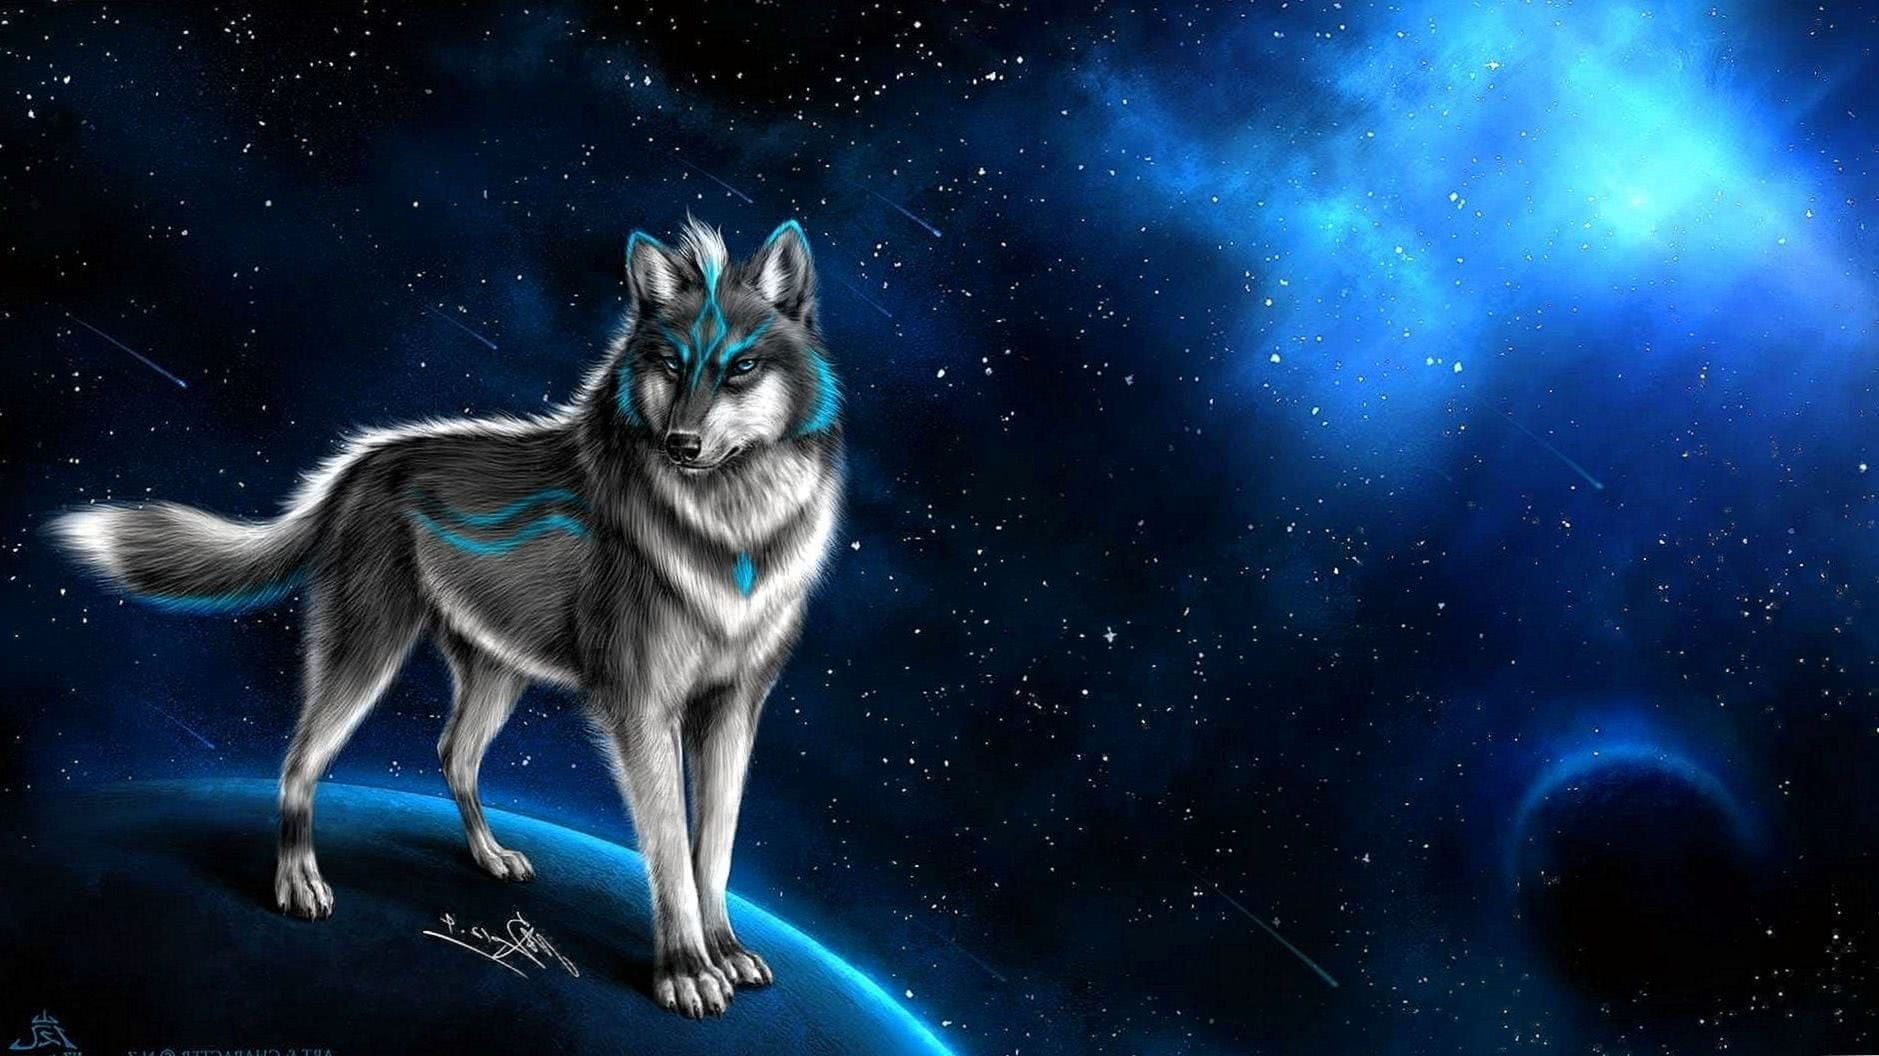 Fantasy Wolf Wallpaper For Desktop